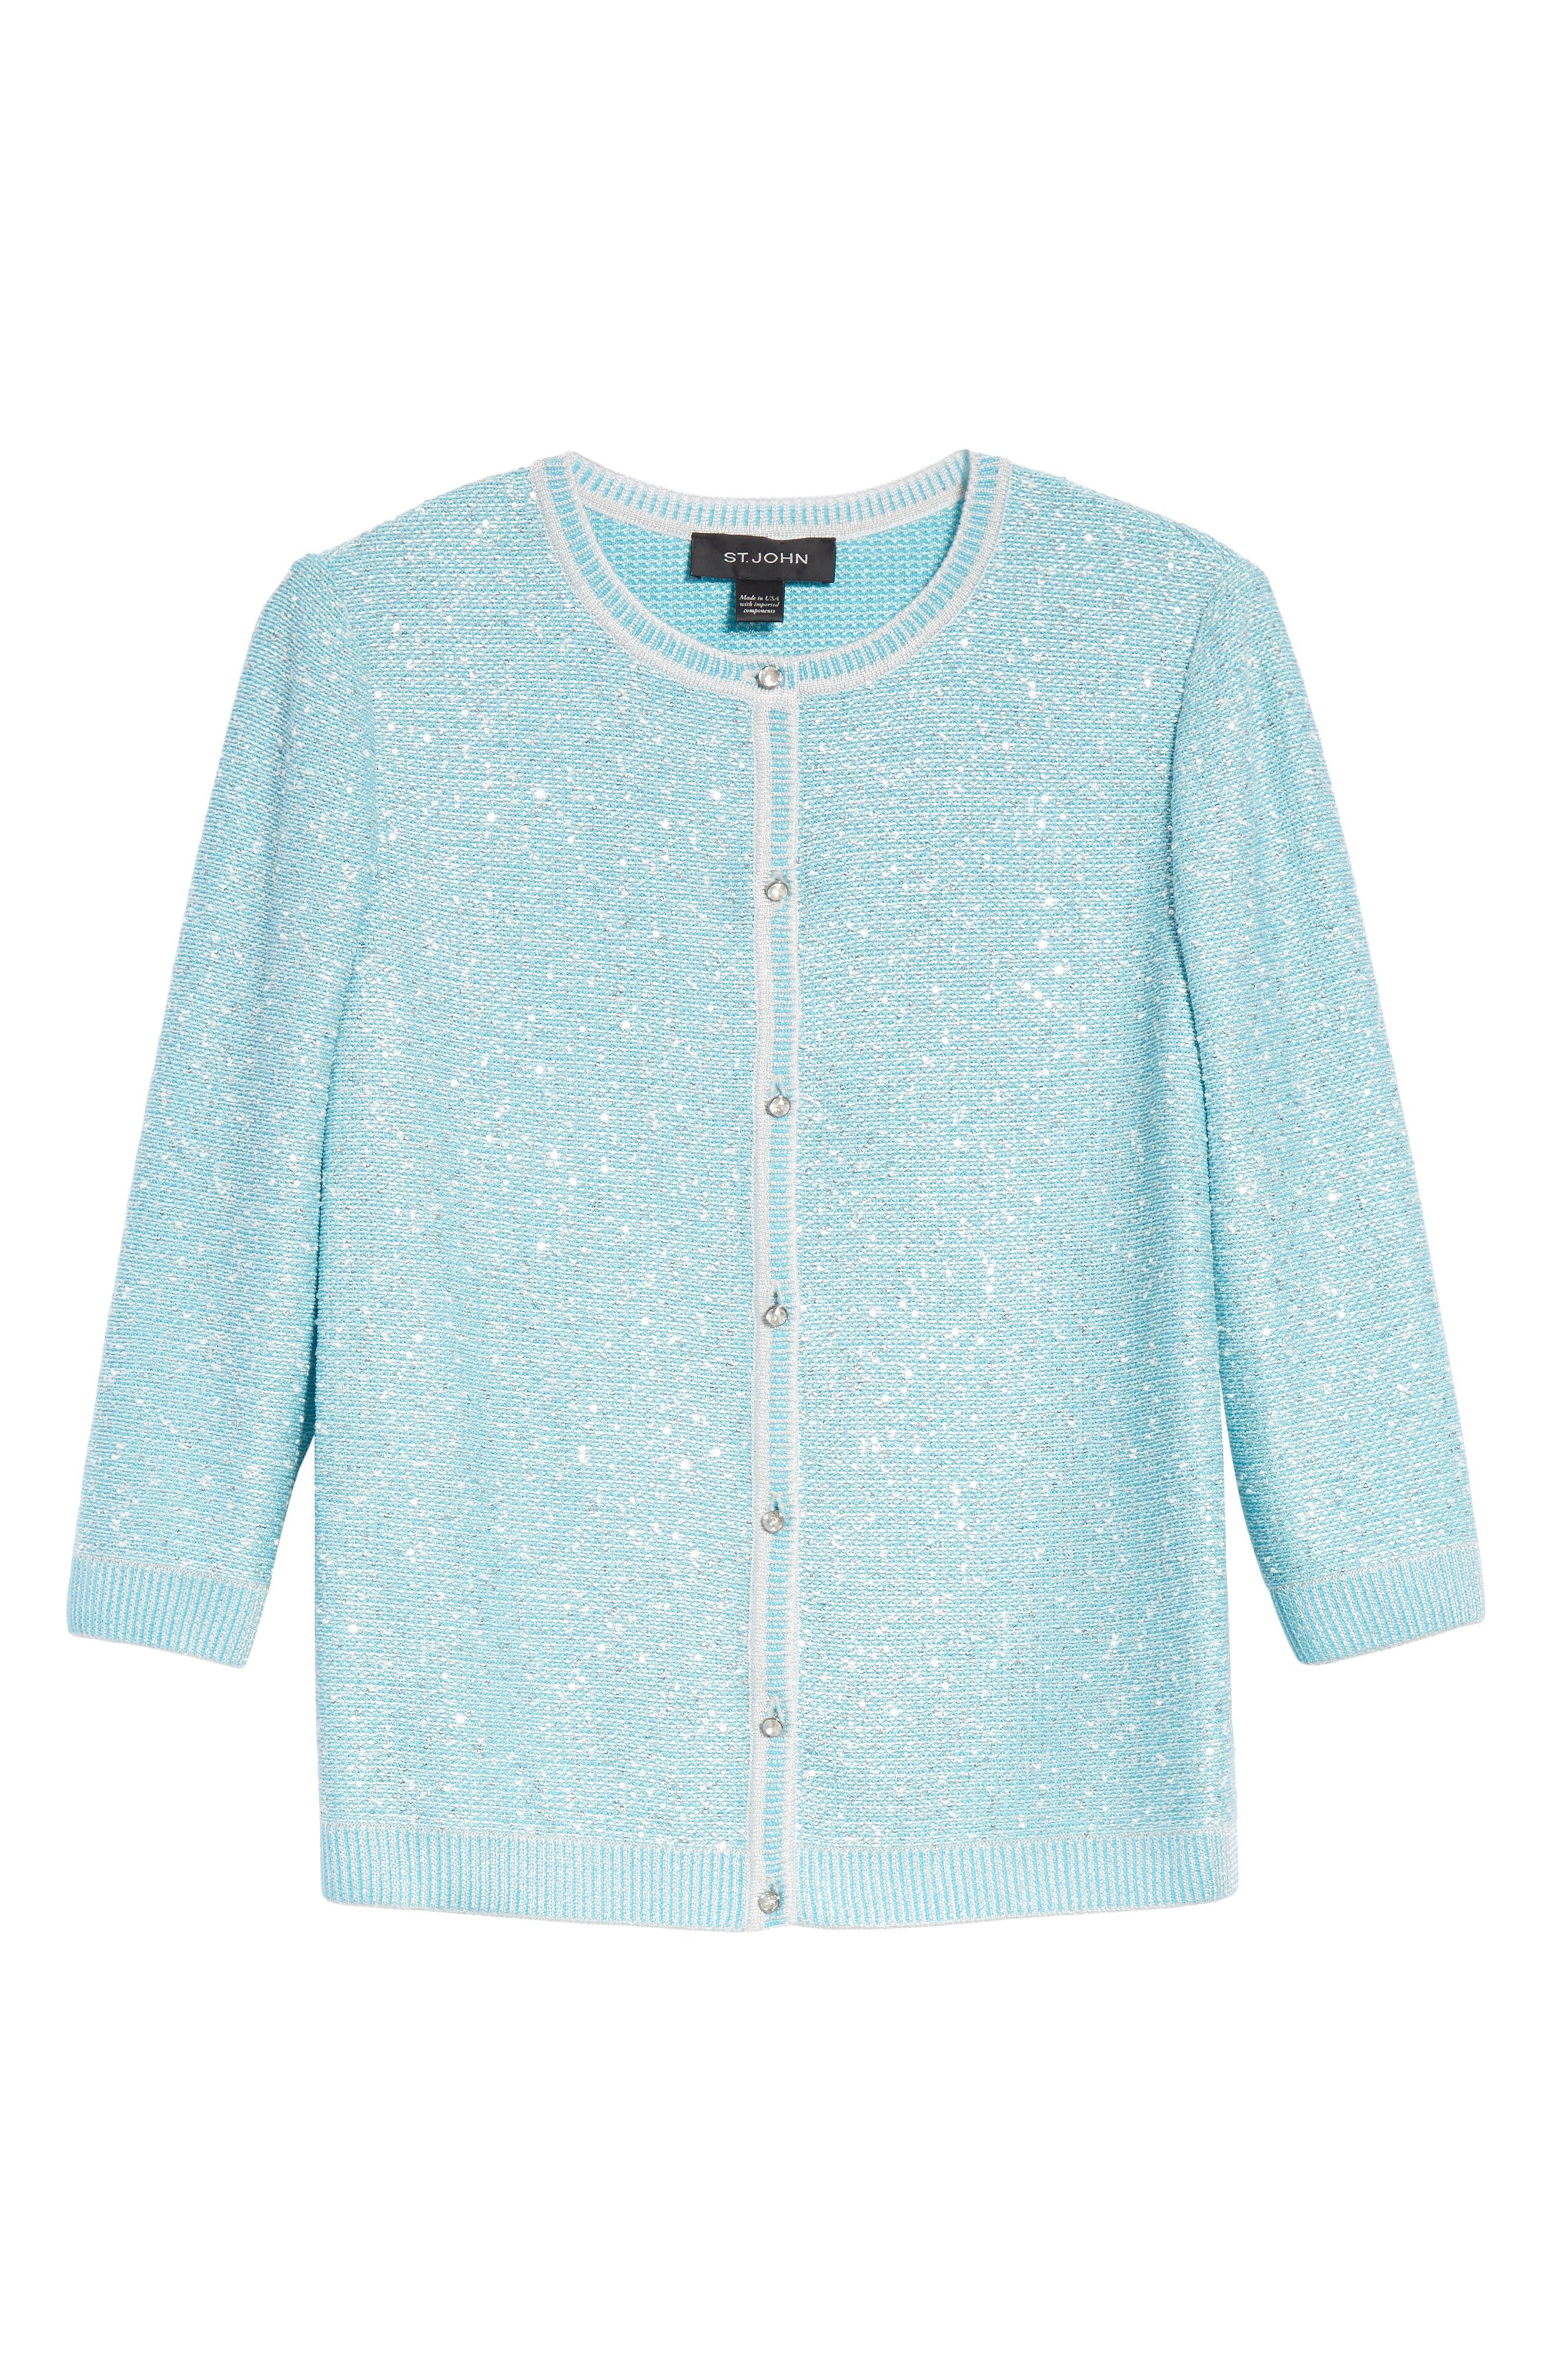 Flecked Sparkle Knit Cardigan,                             Alternate thumbnail 6, color,                             400